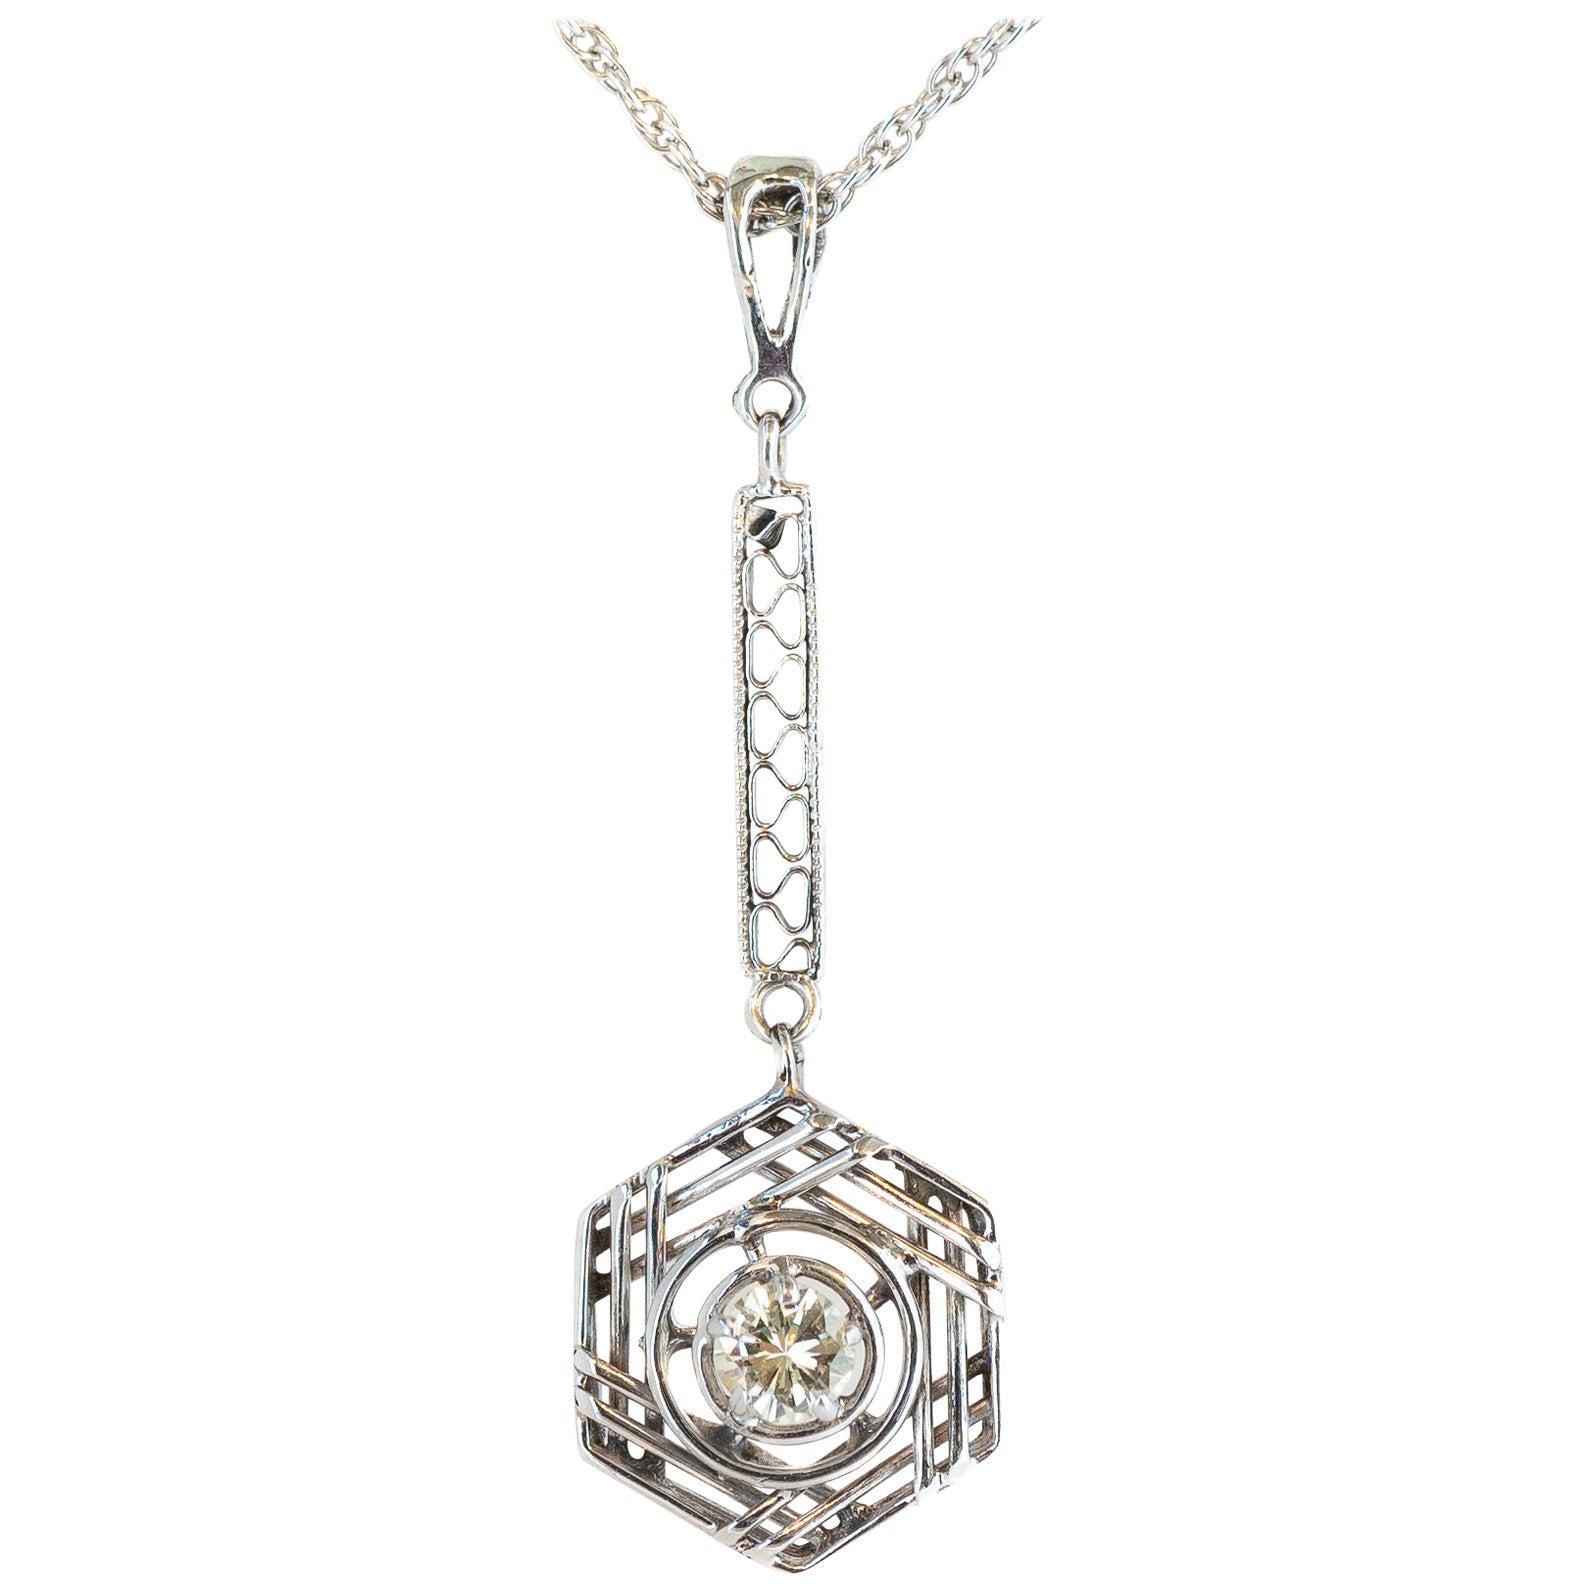 0.25 Carat Diamond Necklace with 14 Karat White Gold Filigree Pendant